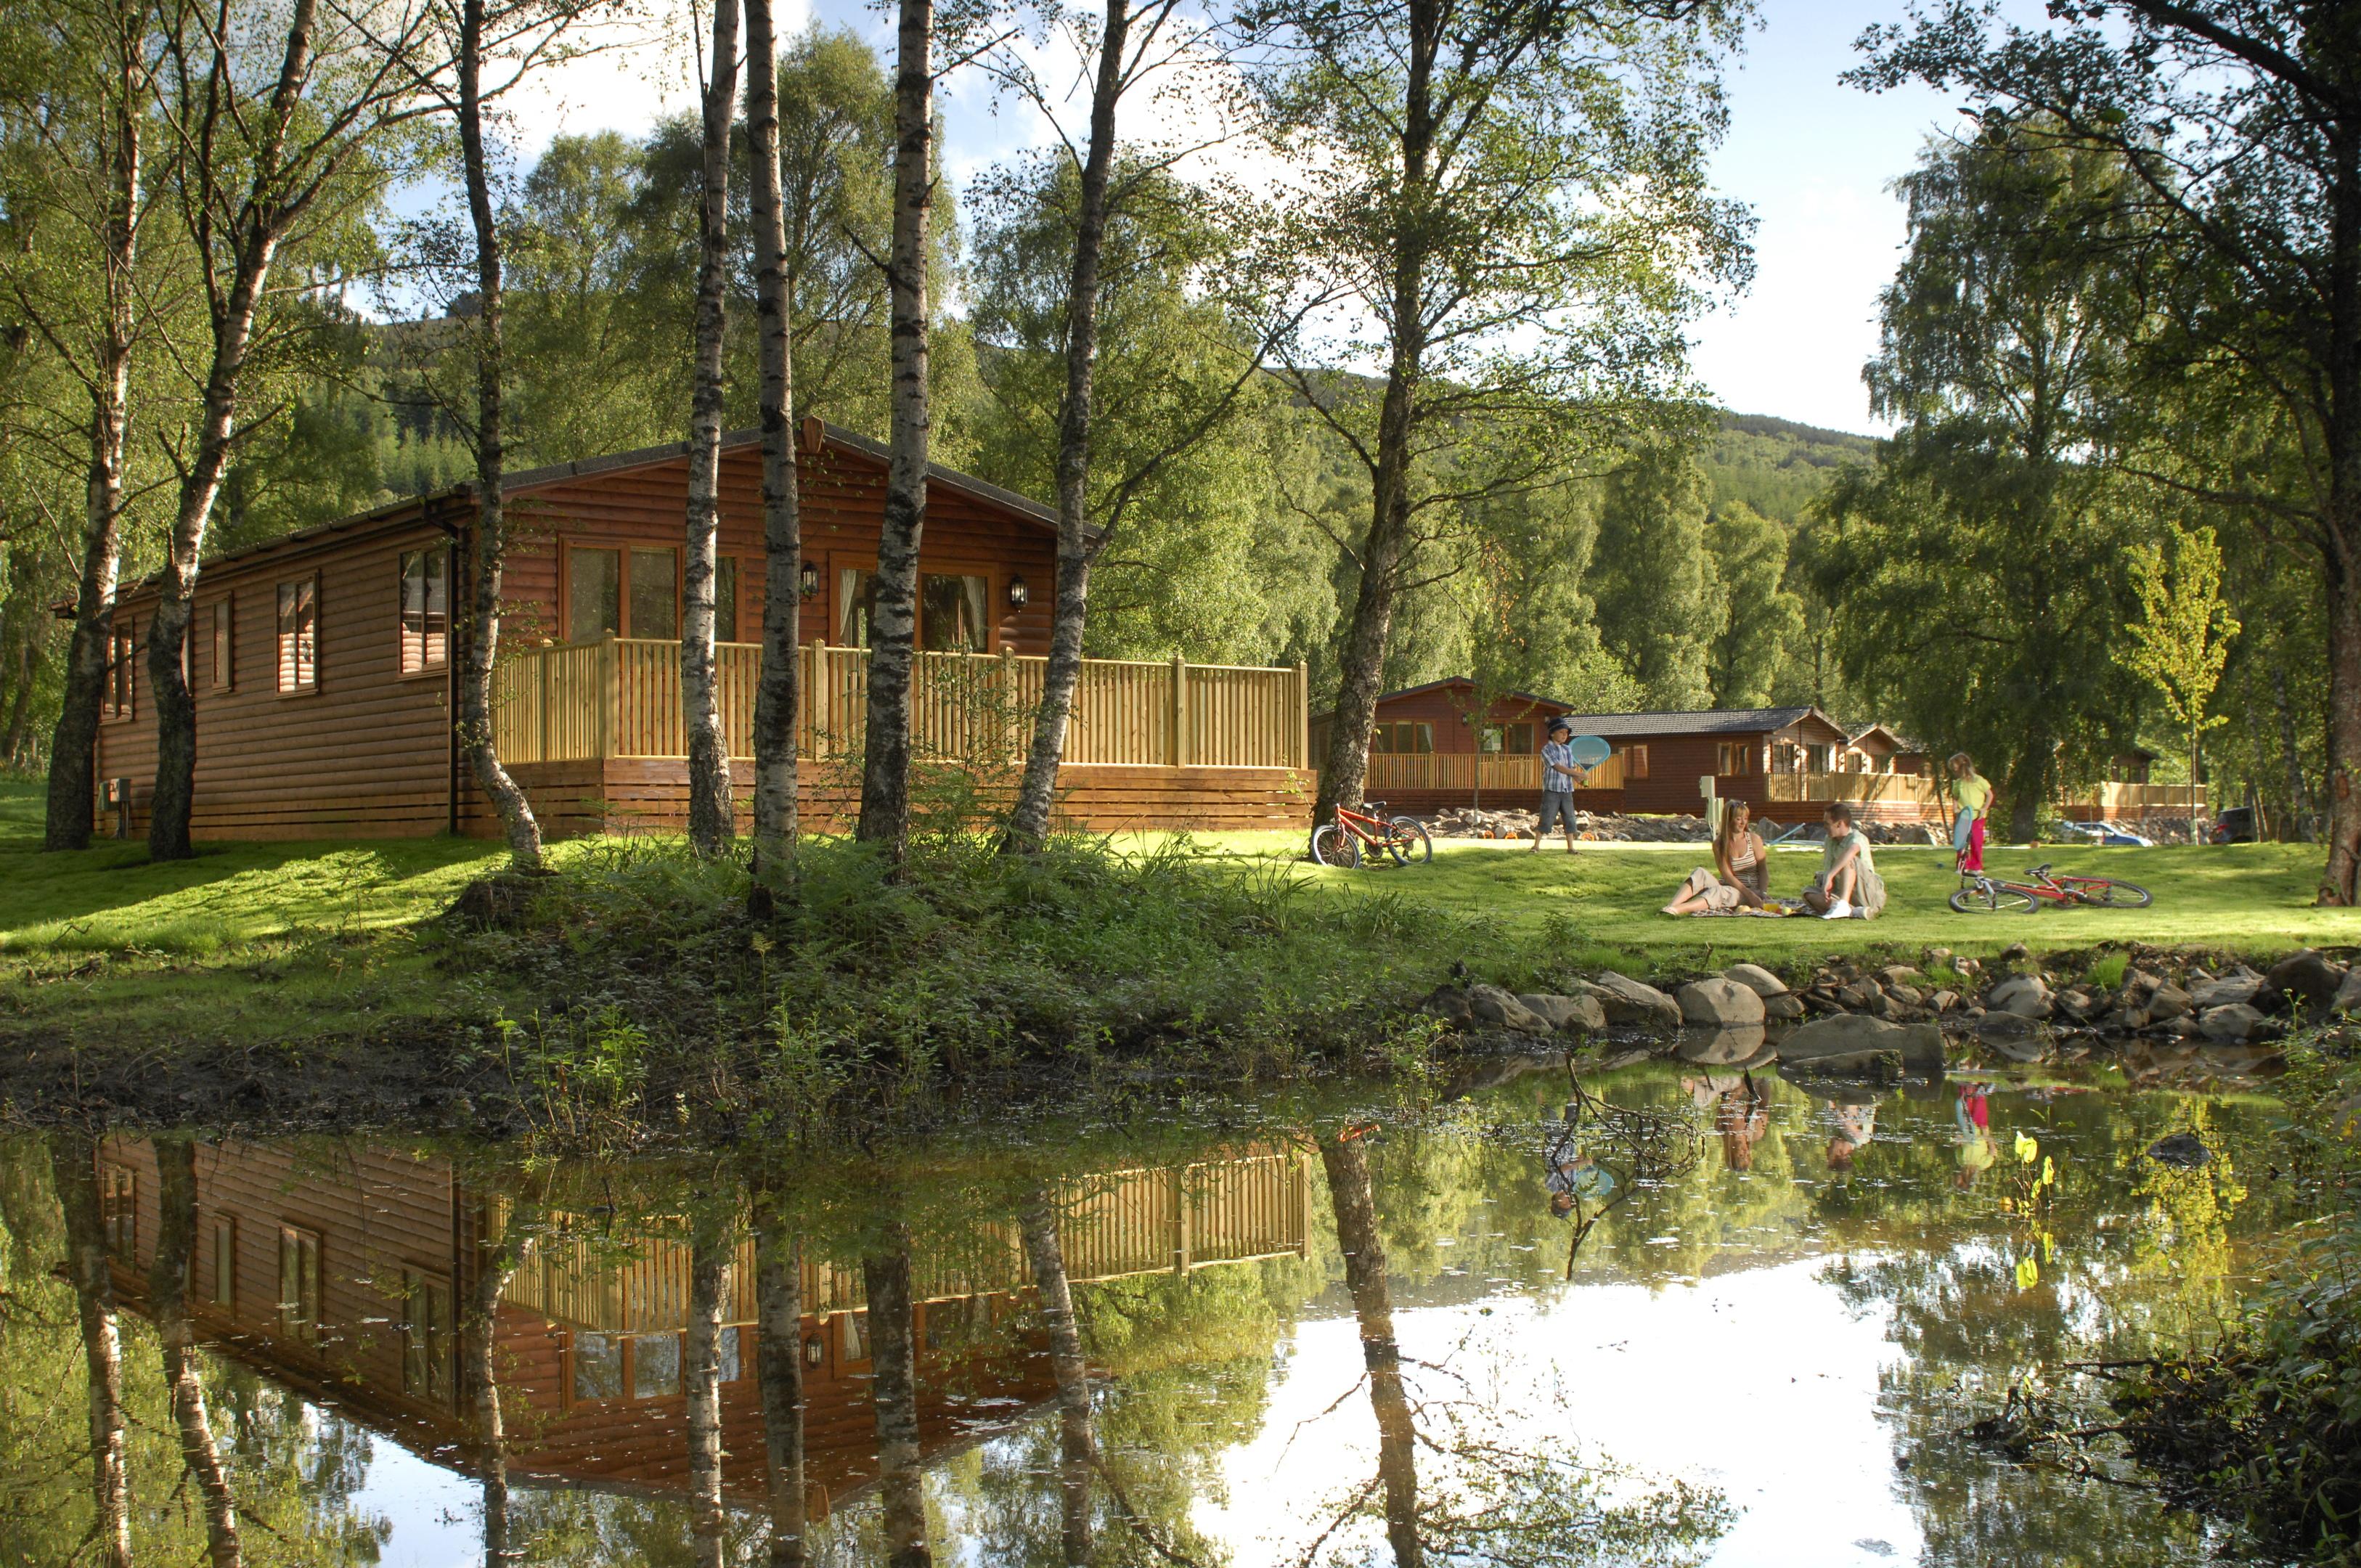 Parkdean's Tummel Valley Holiday Park.